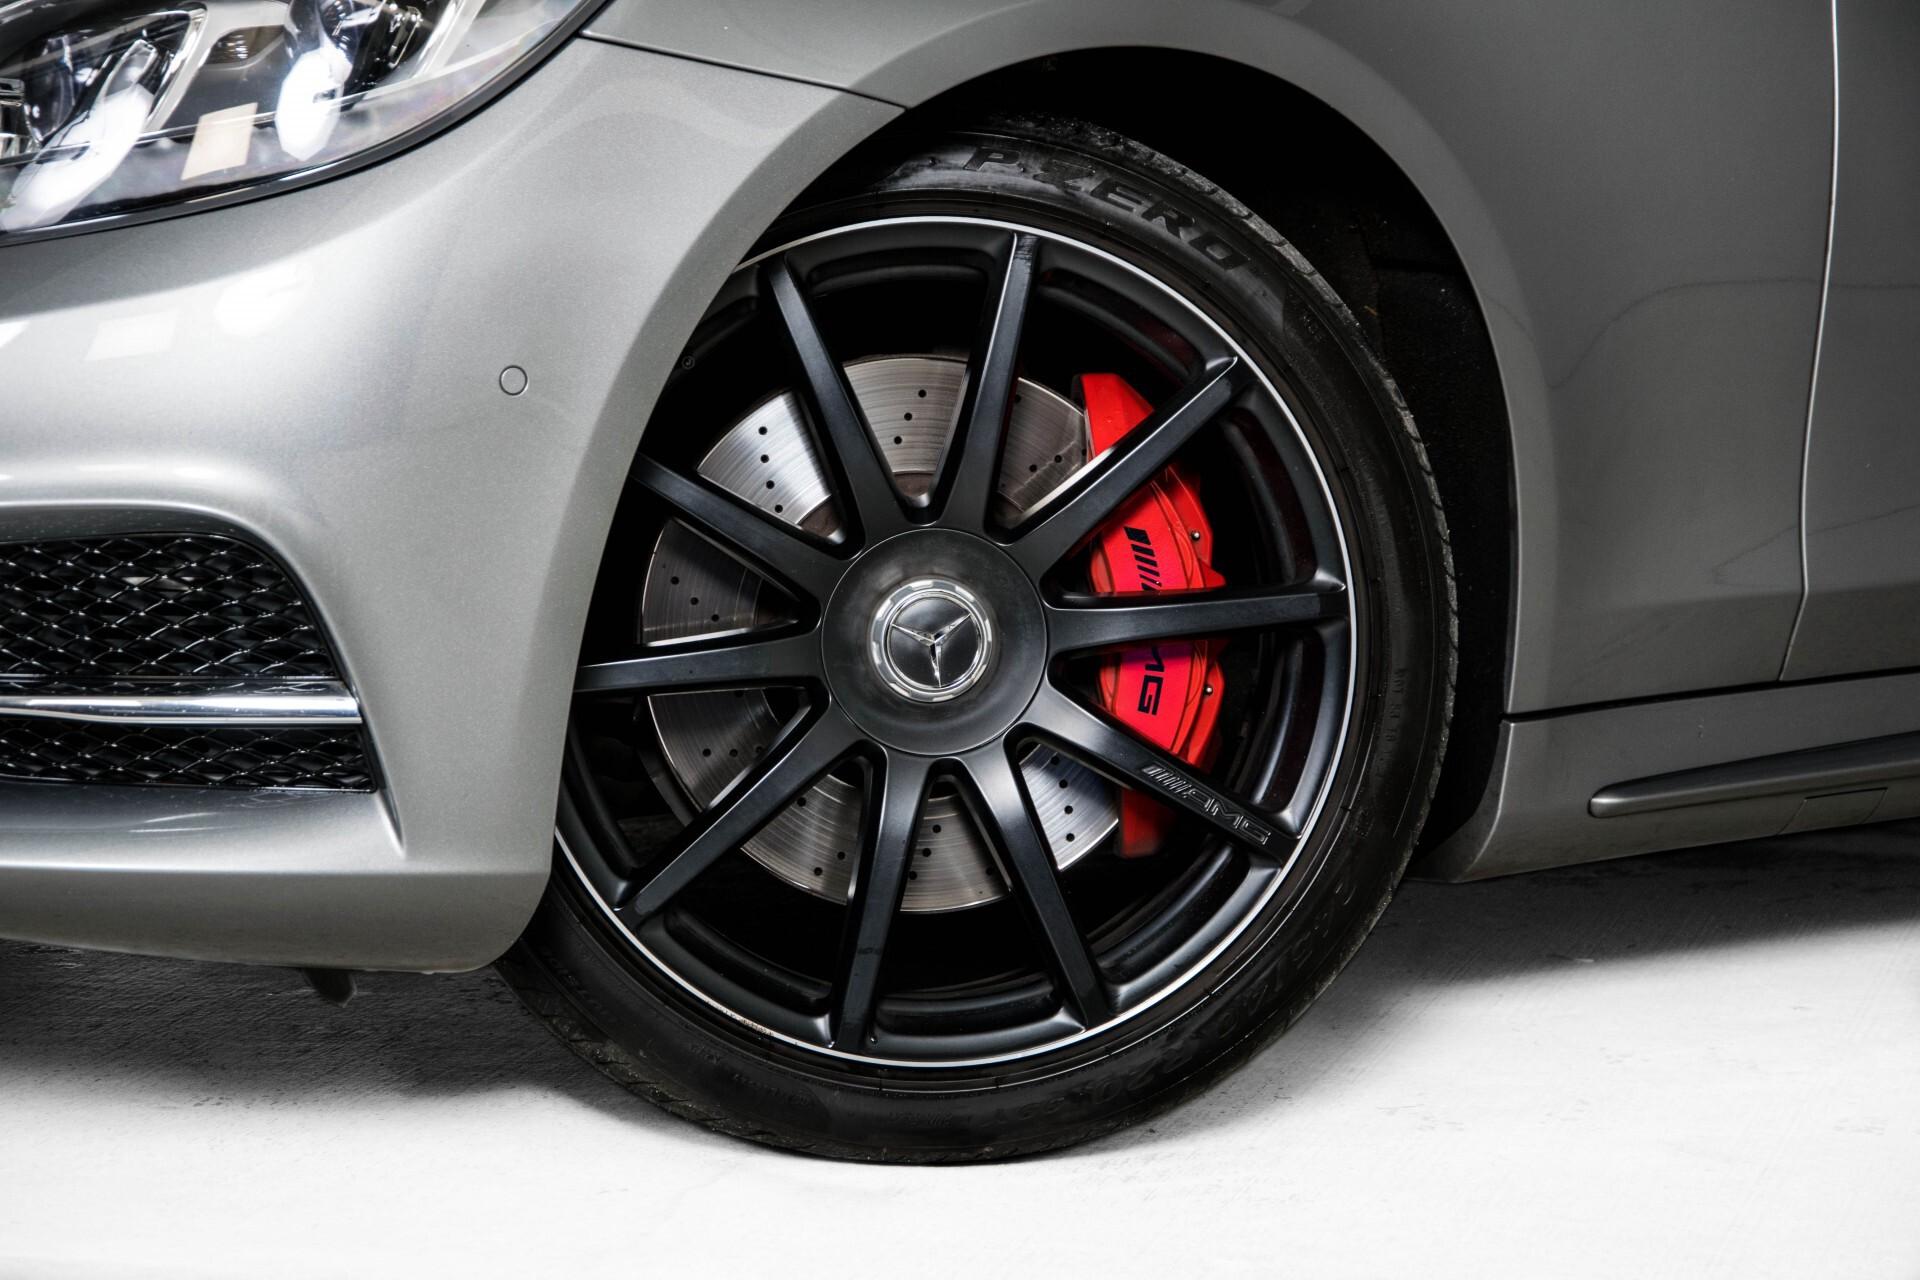 Mercedes-Benz S-Klasse 350 BlueTEC 63 AMG Panorama/Distronic/Keyless/Massage/Burmester Aut7 Foto 42